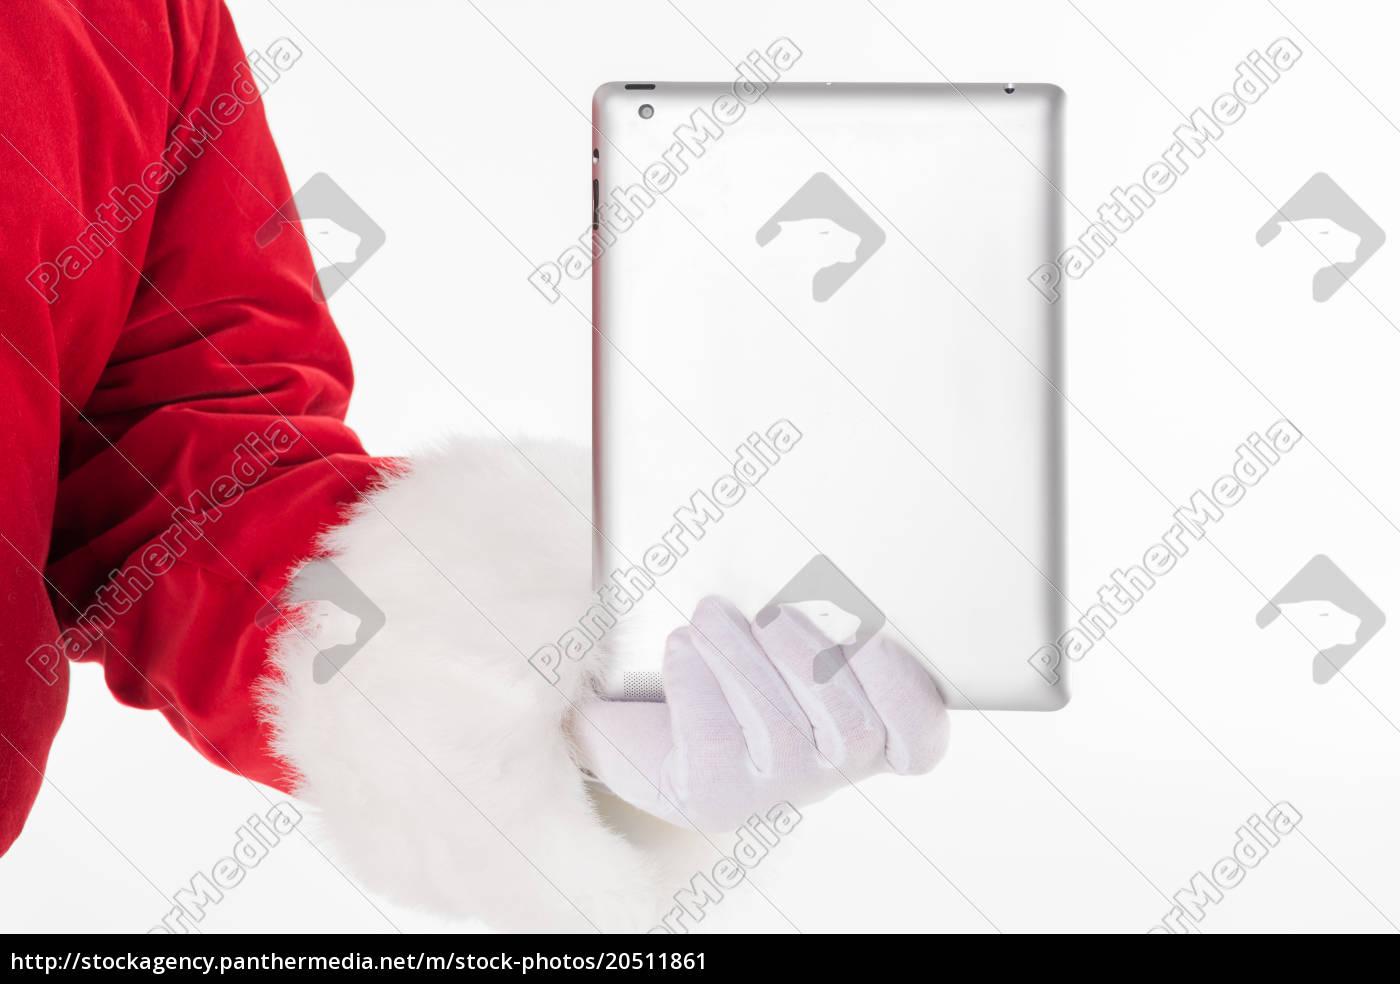 santa, claus, hand, showing, digital, tablet - 20511861